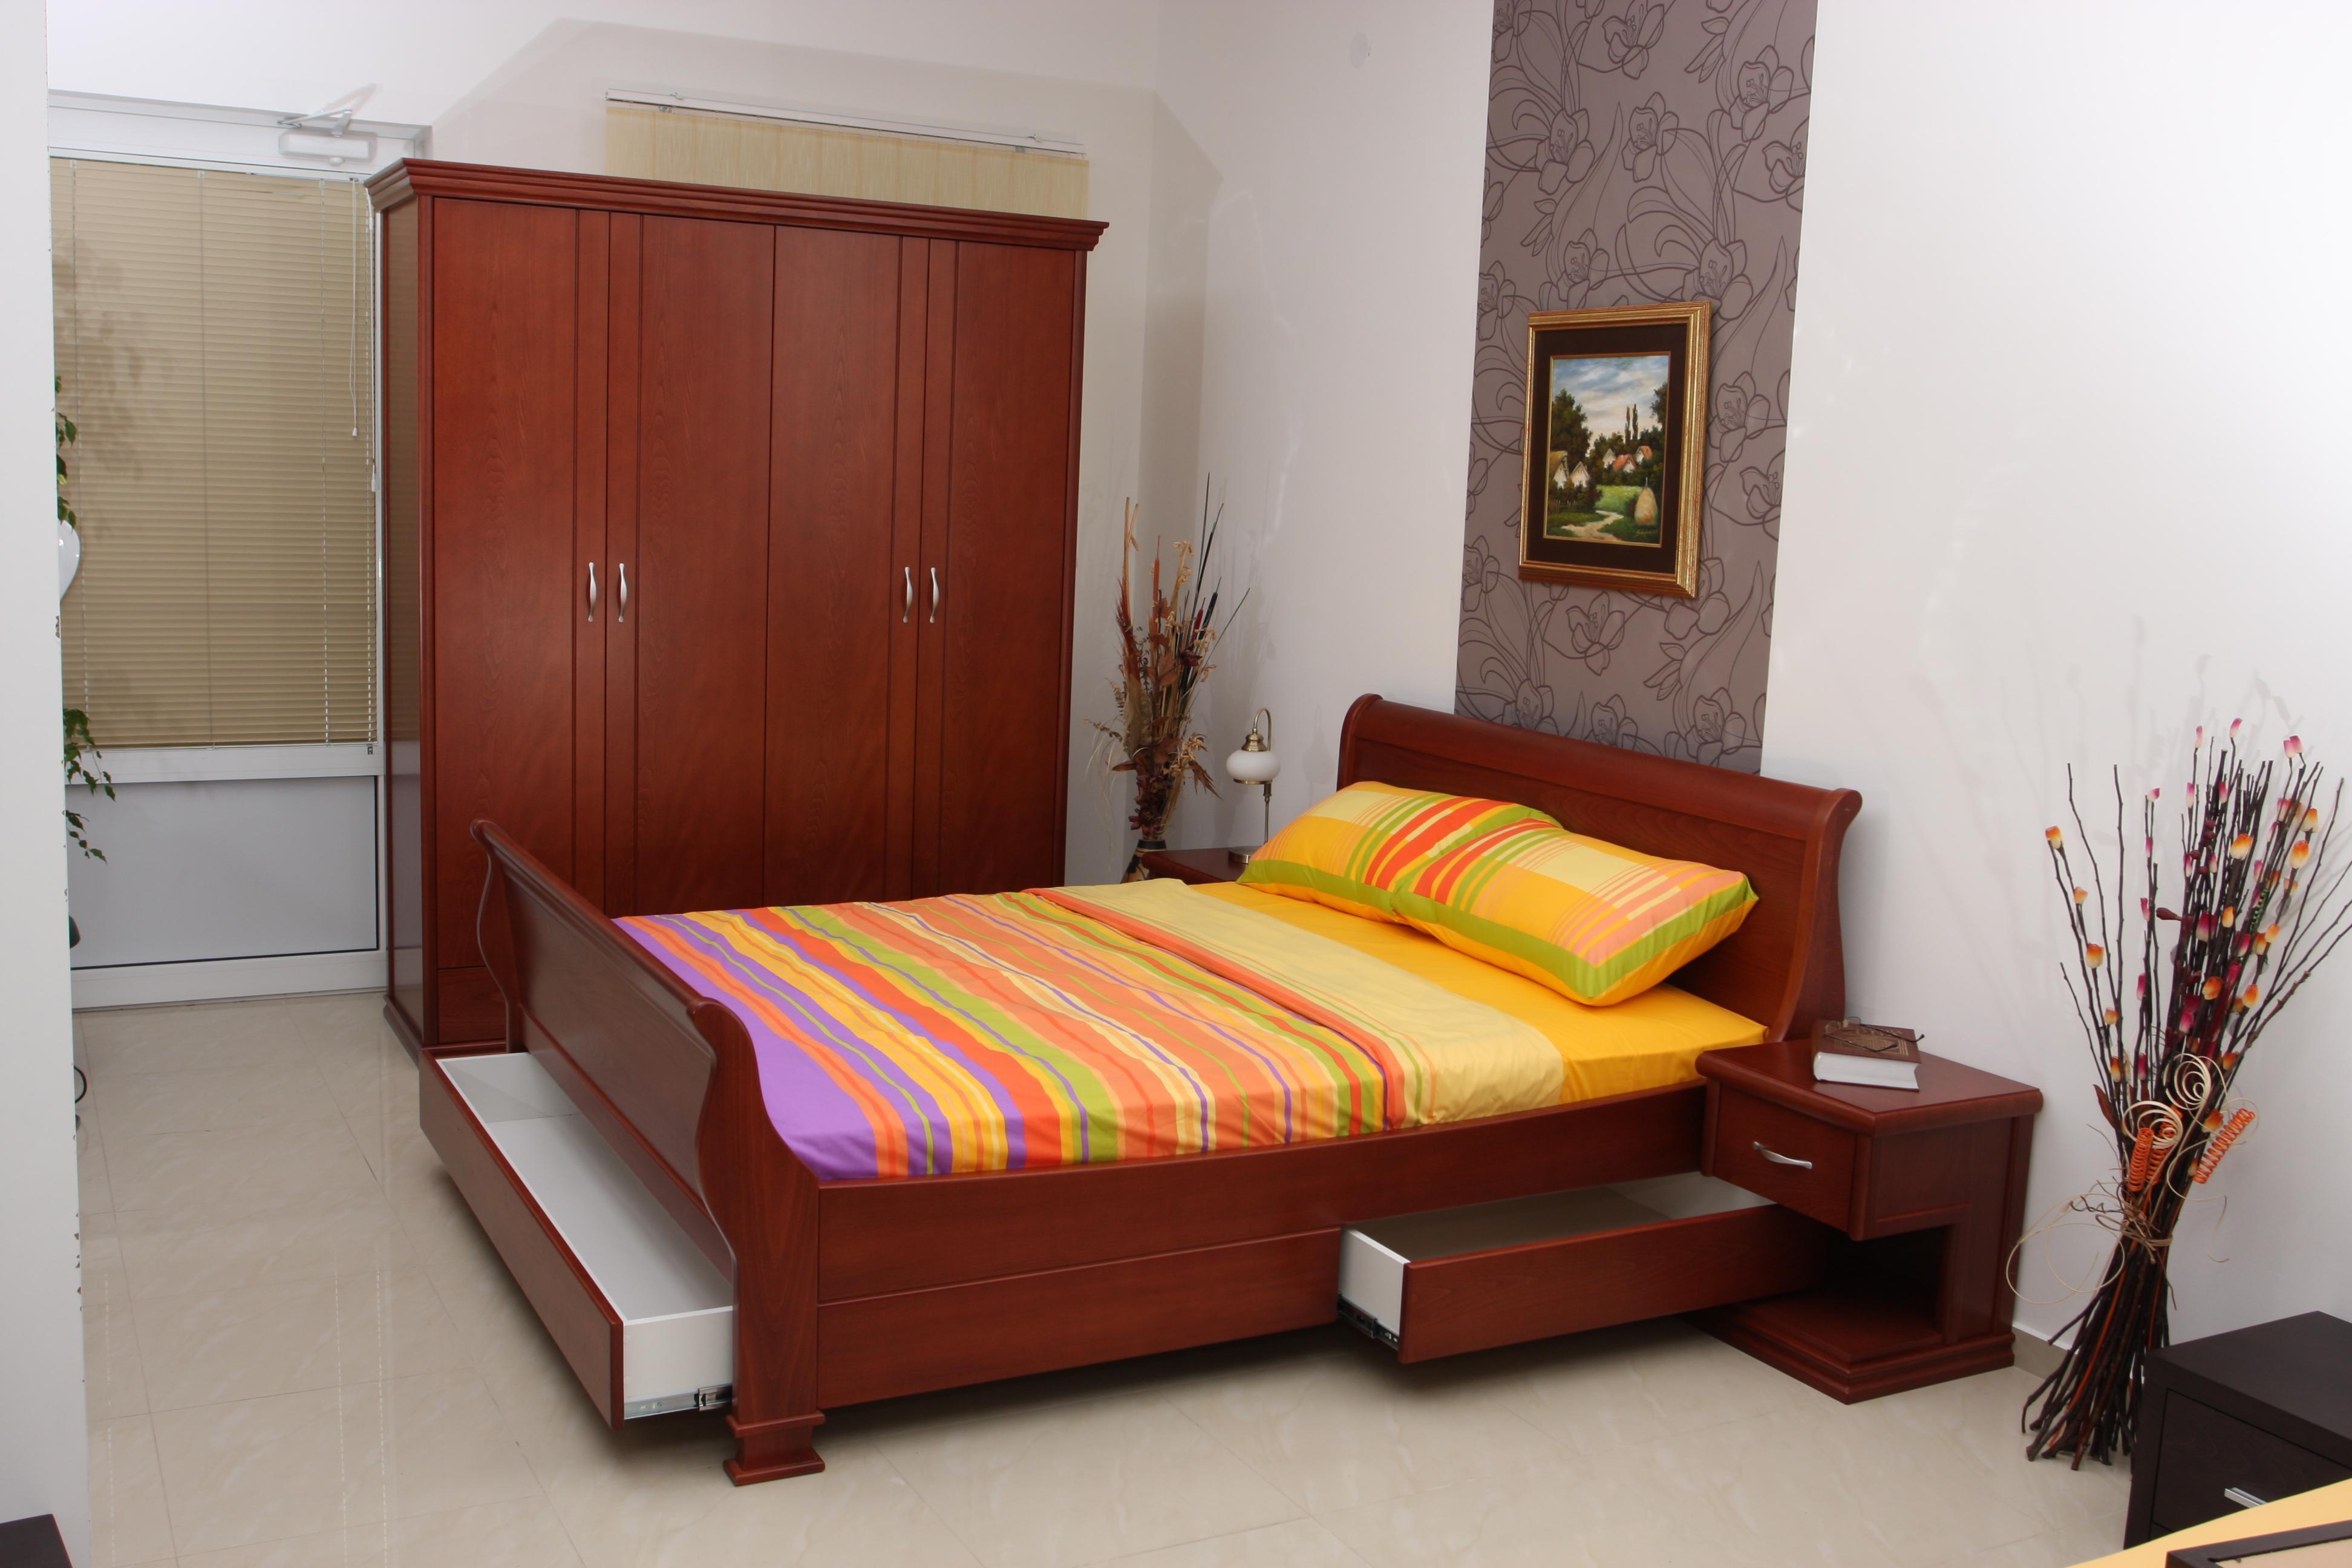 Chambre A Coucher Maroc Deco : Davaus chambre a coucher pour garcon maroc avec